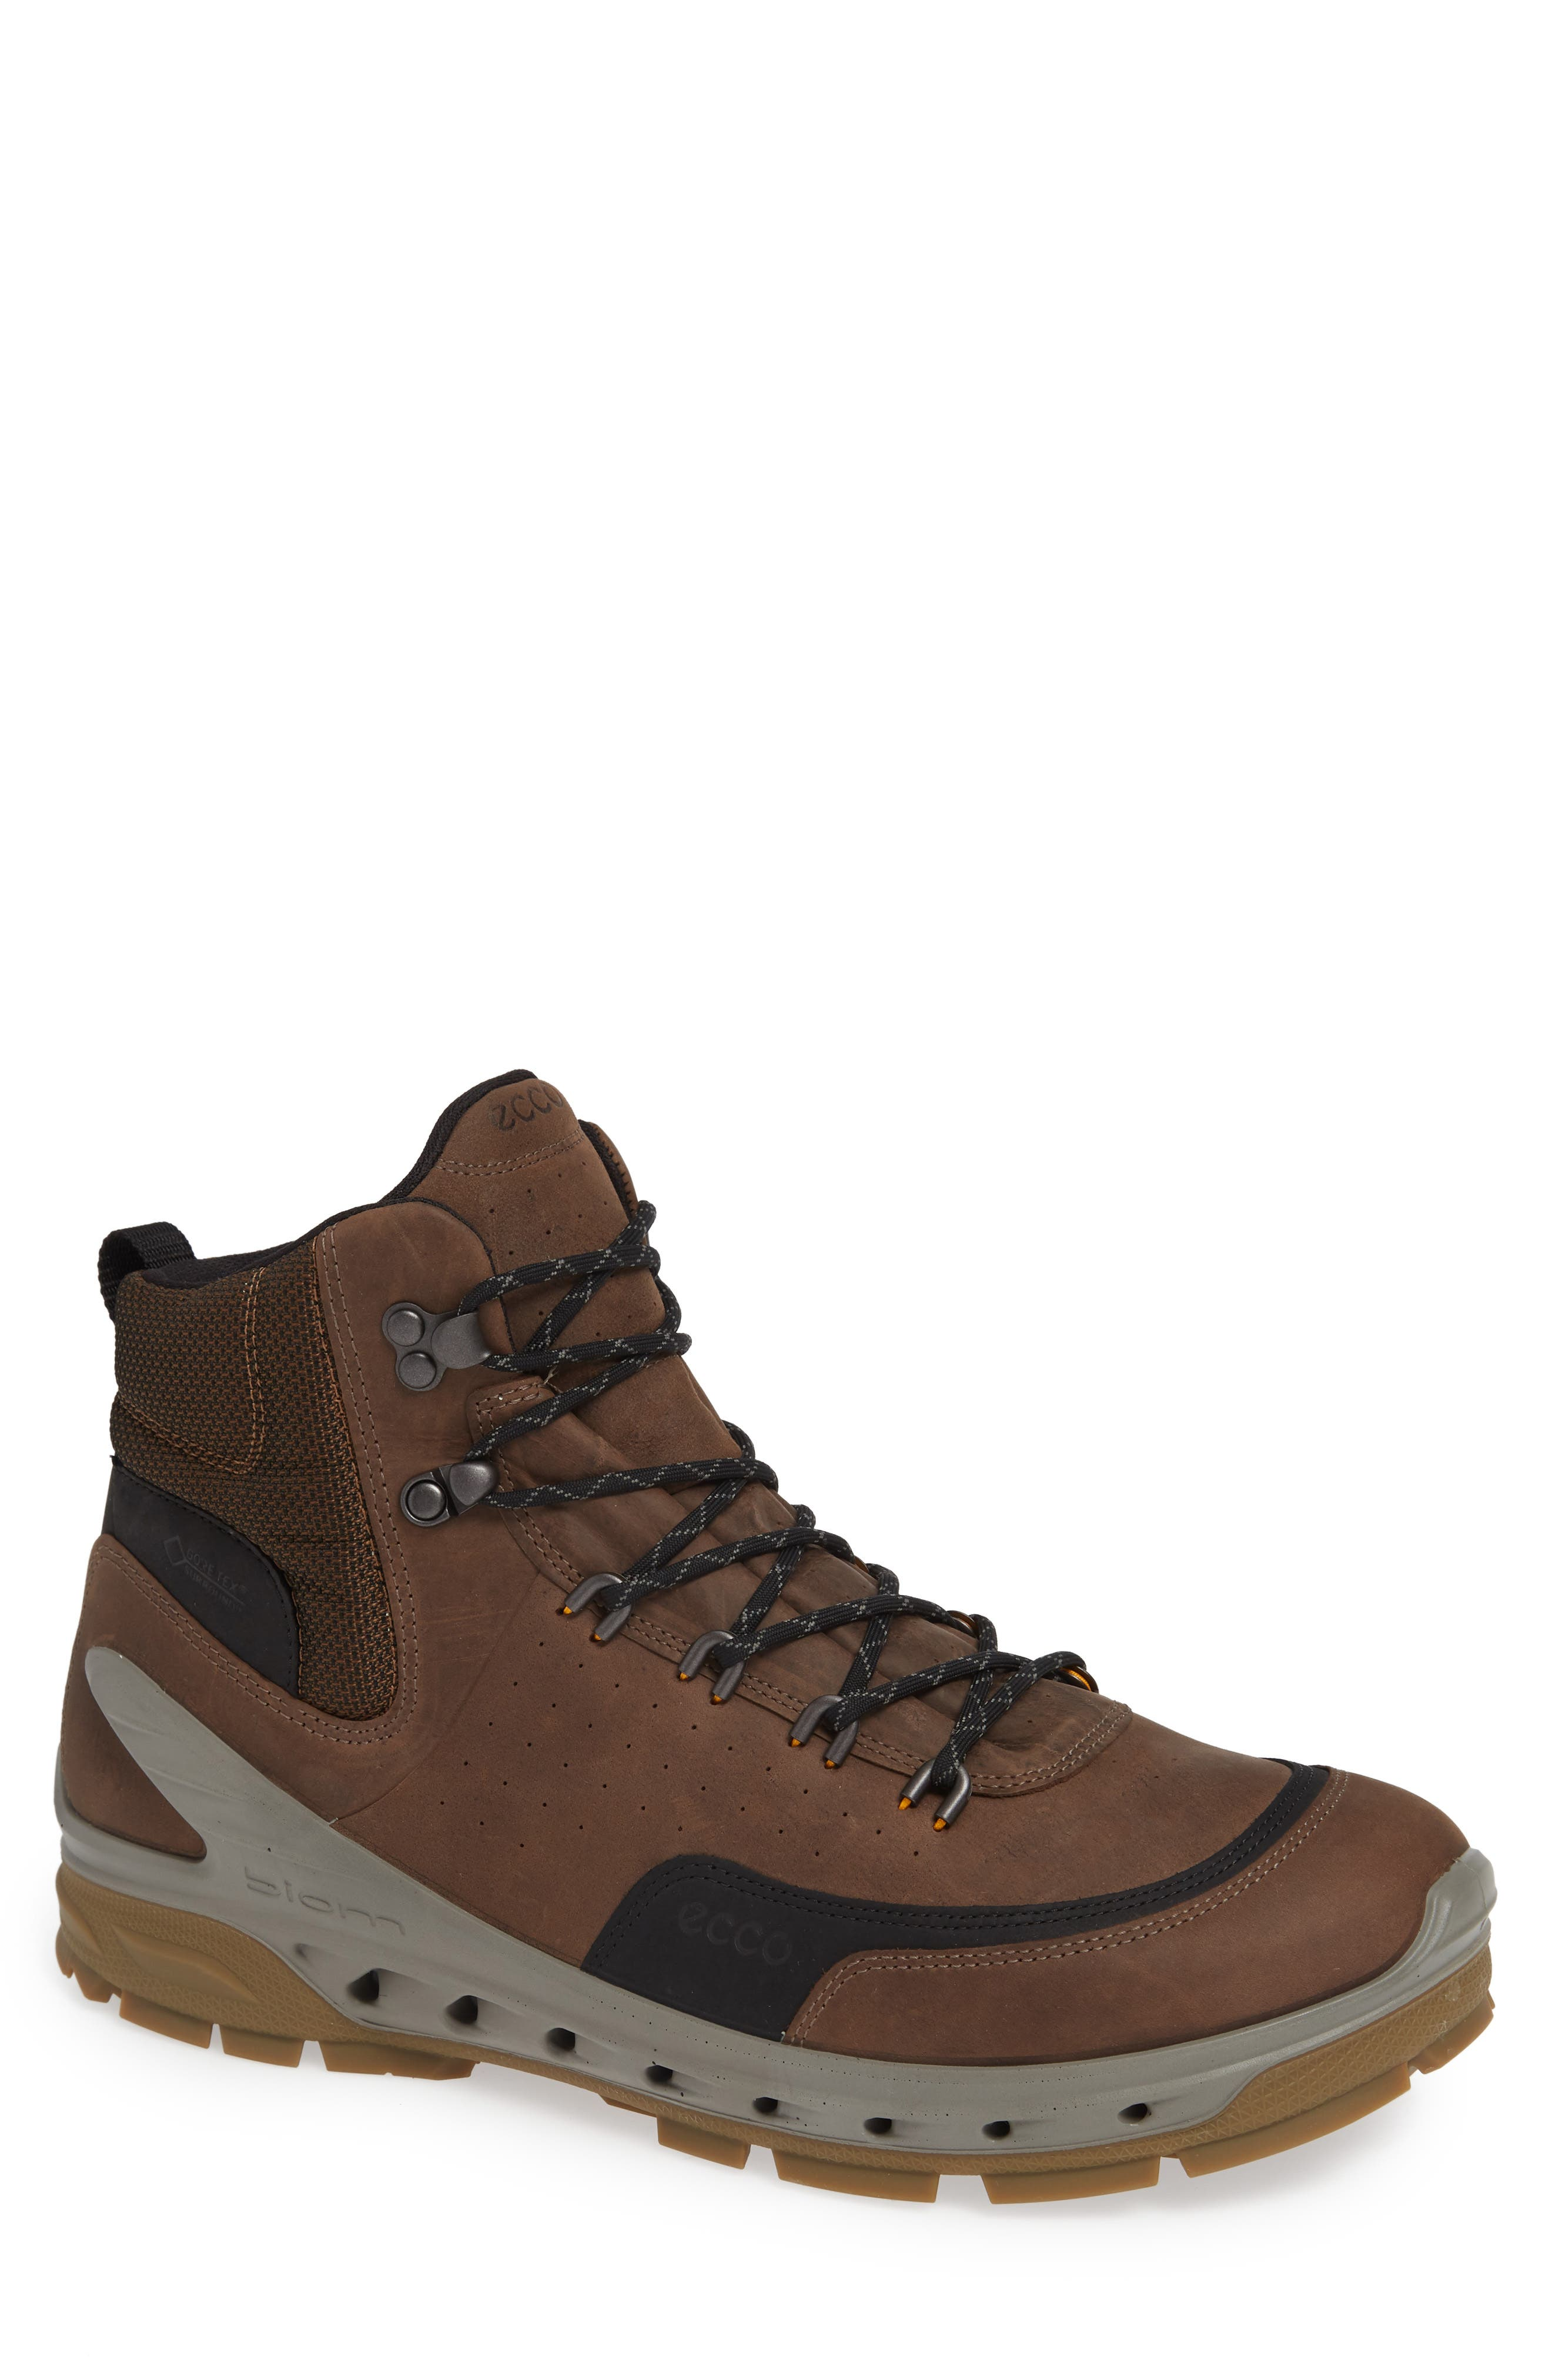 UPC 809704479736 product image for Men's Ecco Biom Venture Tr Gtx Boot, Size 7-7.5US / 41EU - Brown | upcitemdb.com